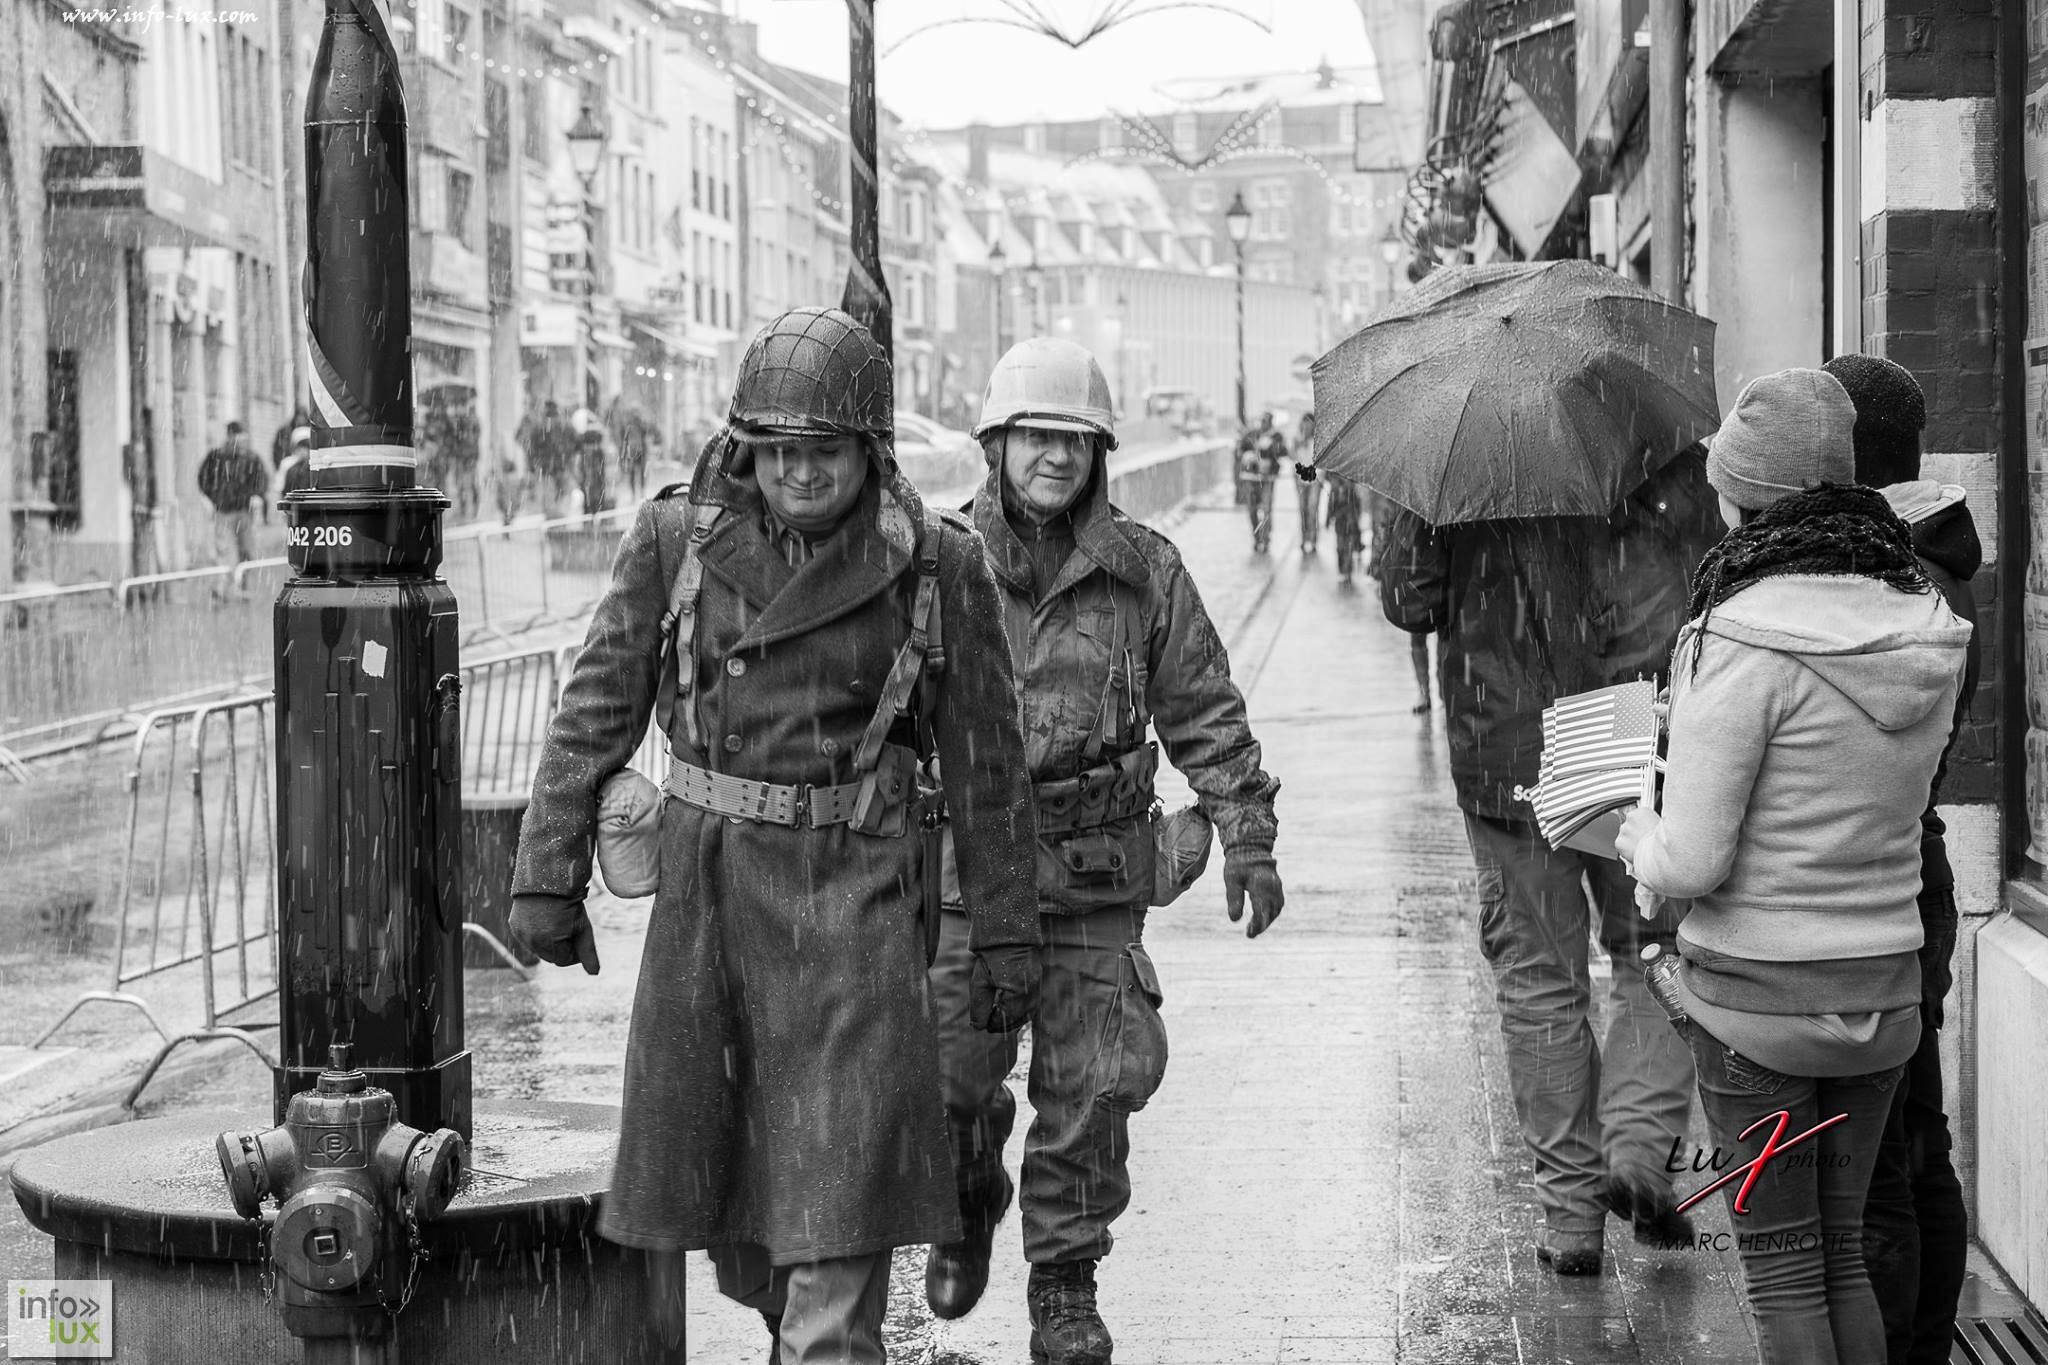 images/stories/PHOTOSREP/Bastogne/70ansMarc1/infoluxBAS035